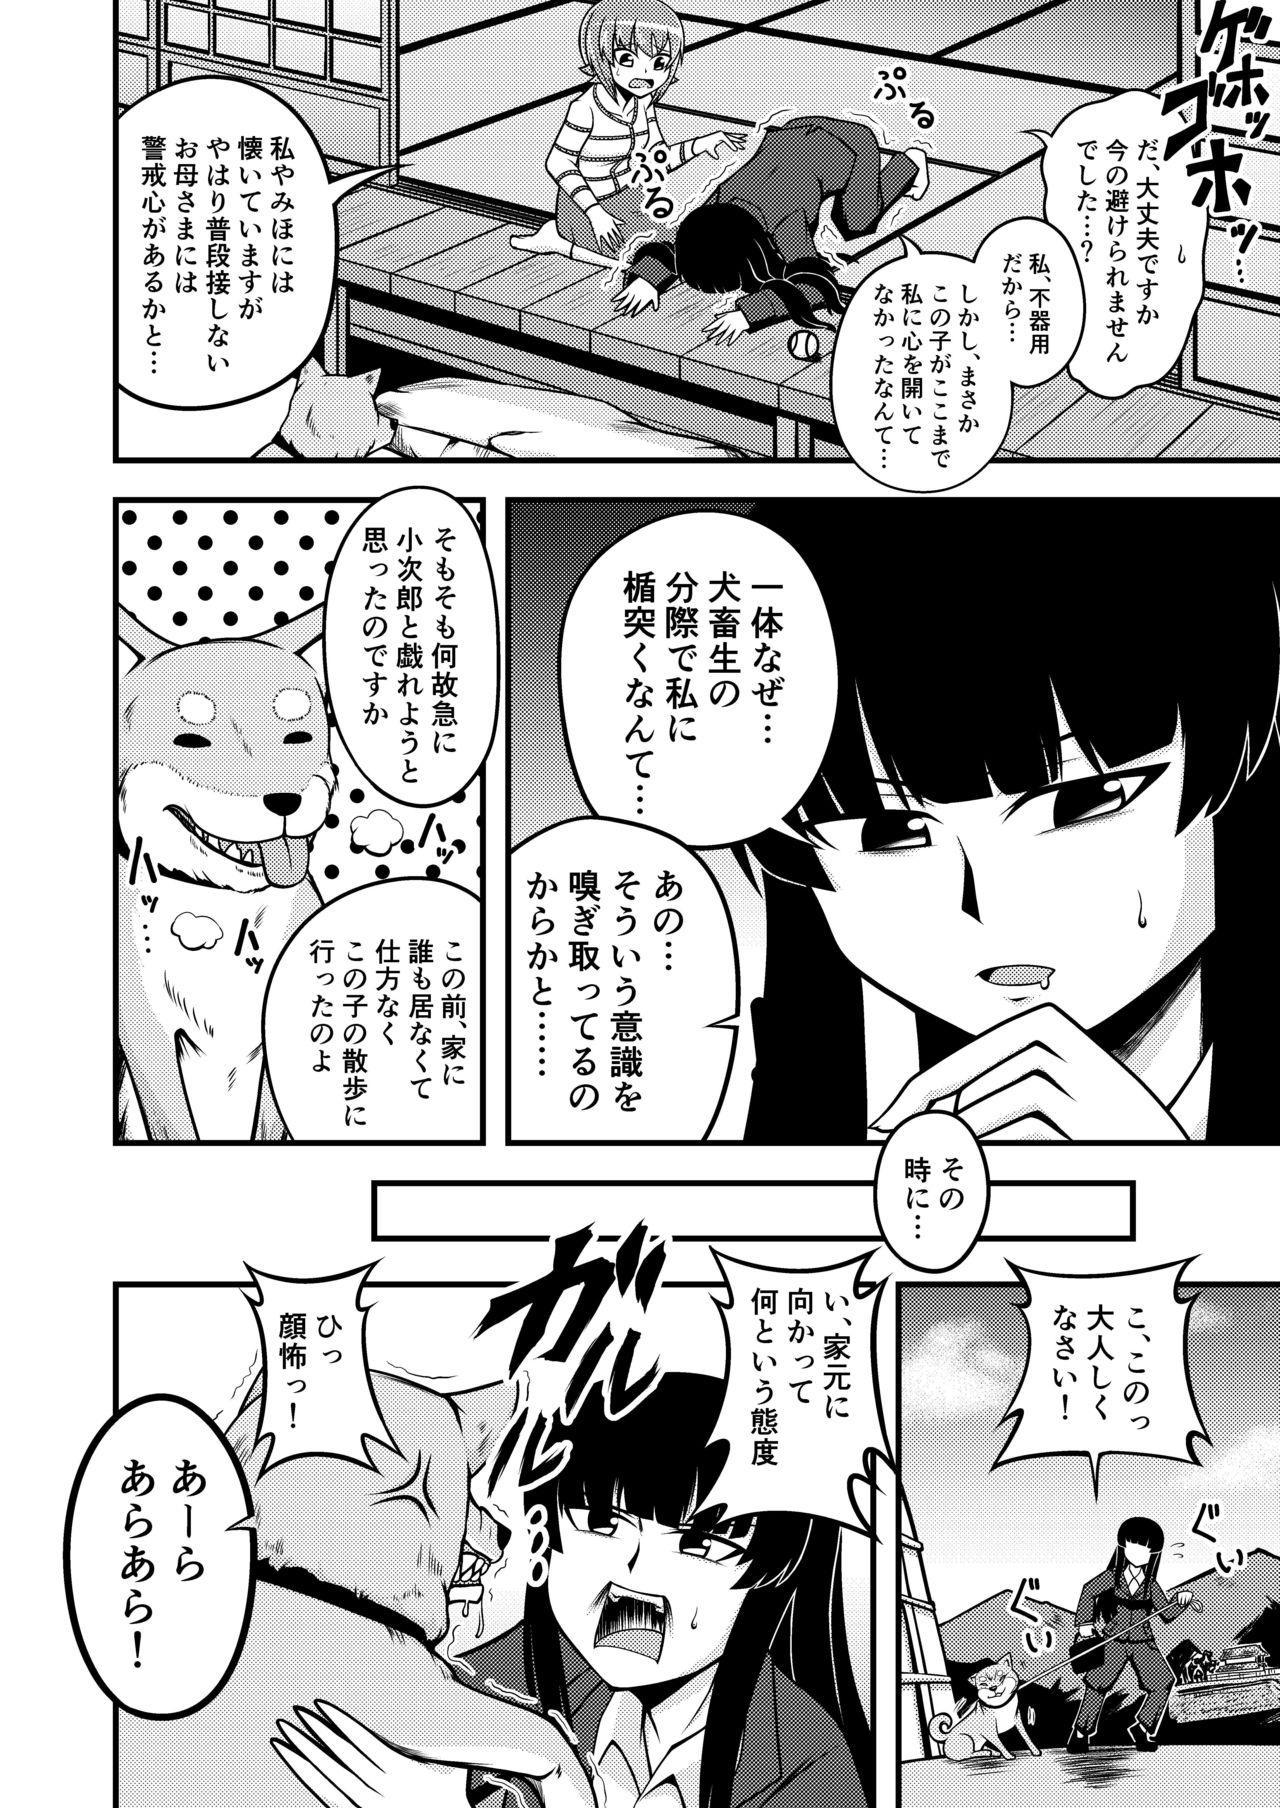 Garupan Iemoto Manga 『Iemoto no Inu』 1